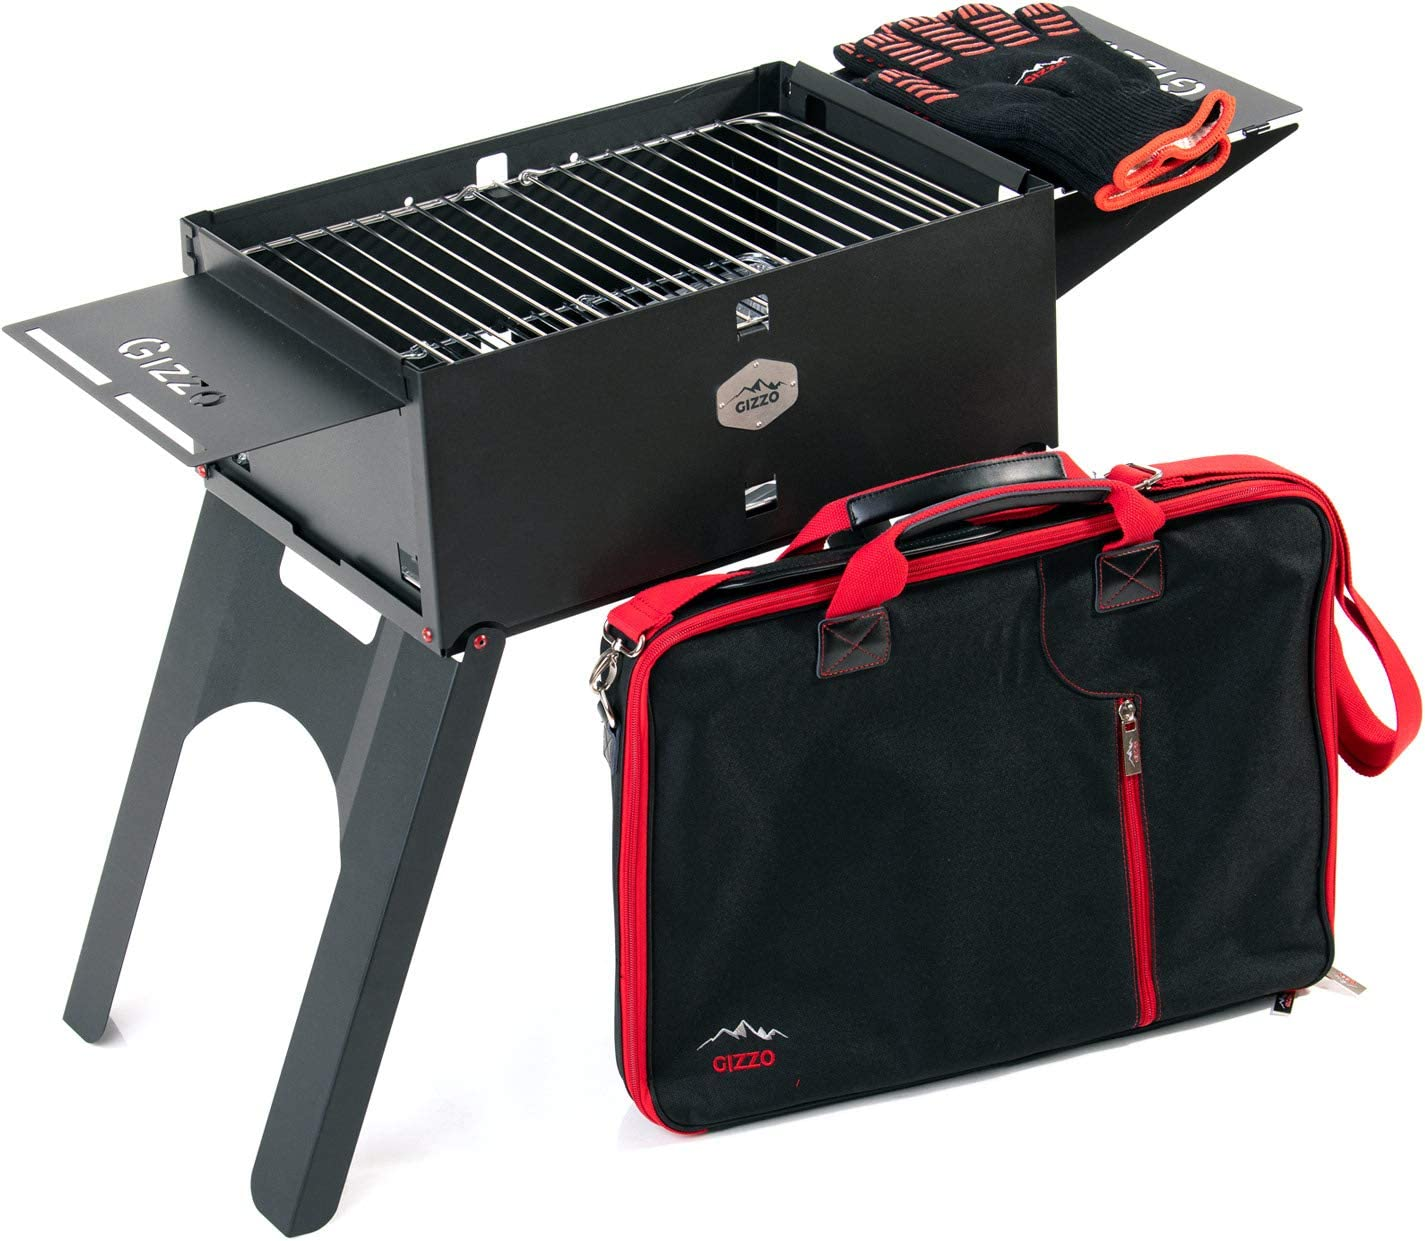 Gizzo Grill Barbacoa portátil con Parrilla de carbón, Plegable, Pícnic y Camping